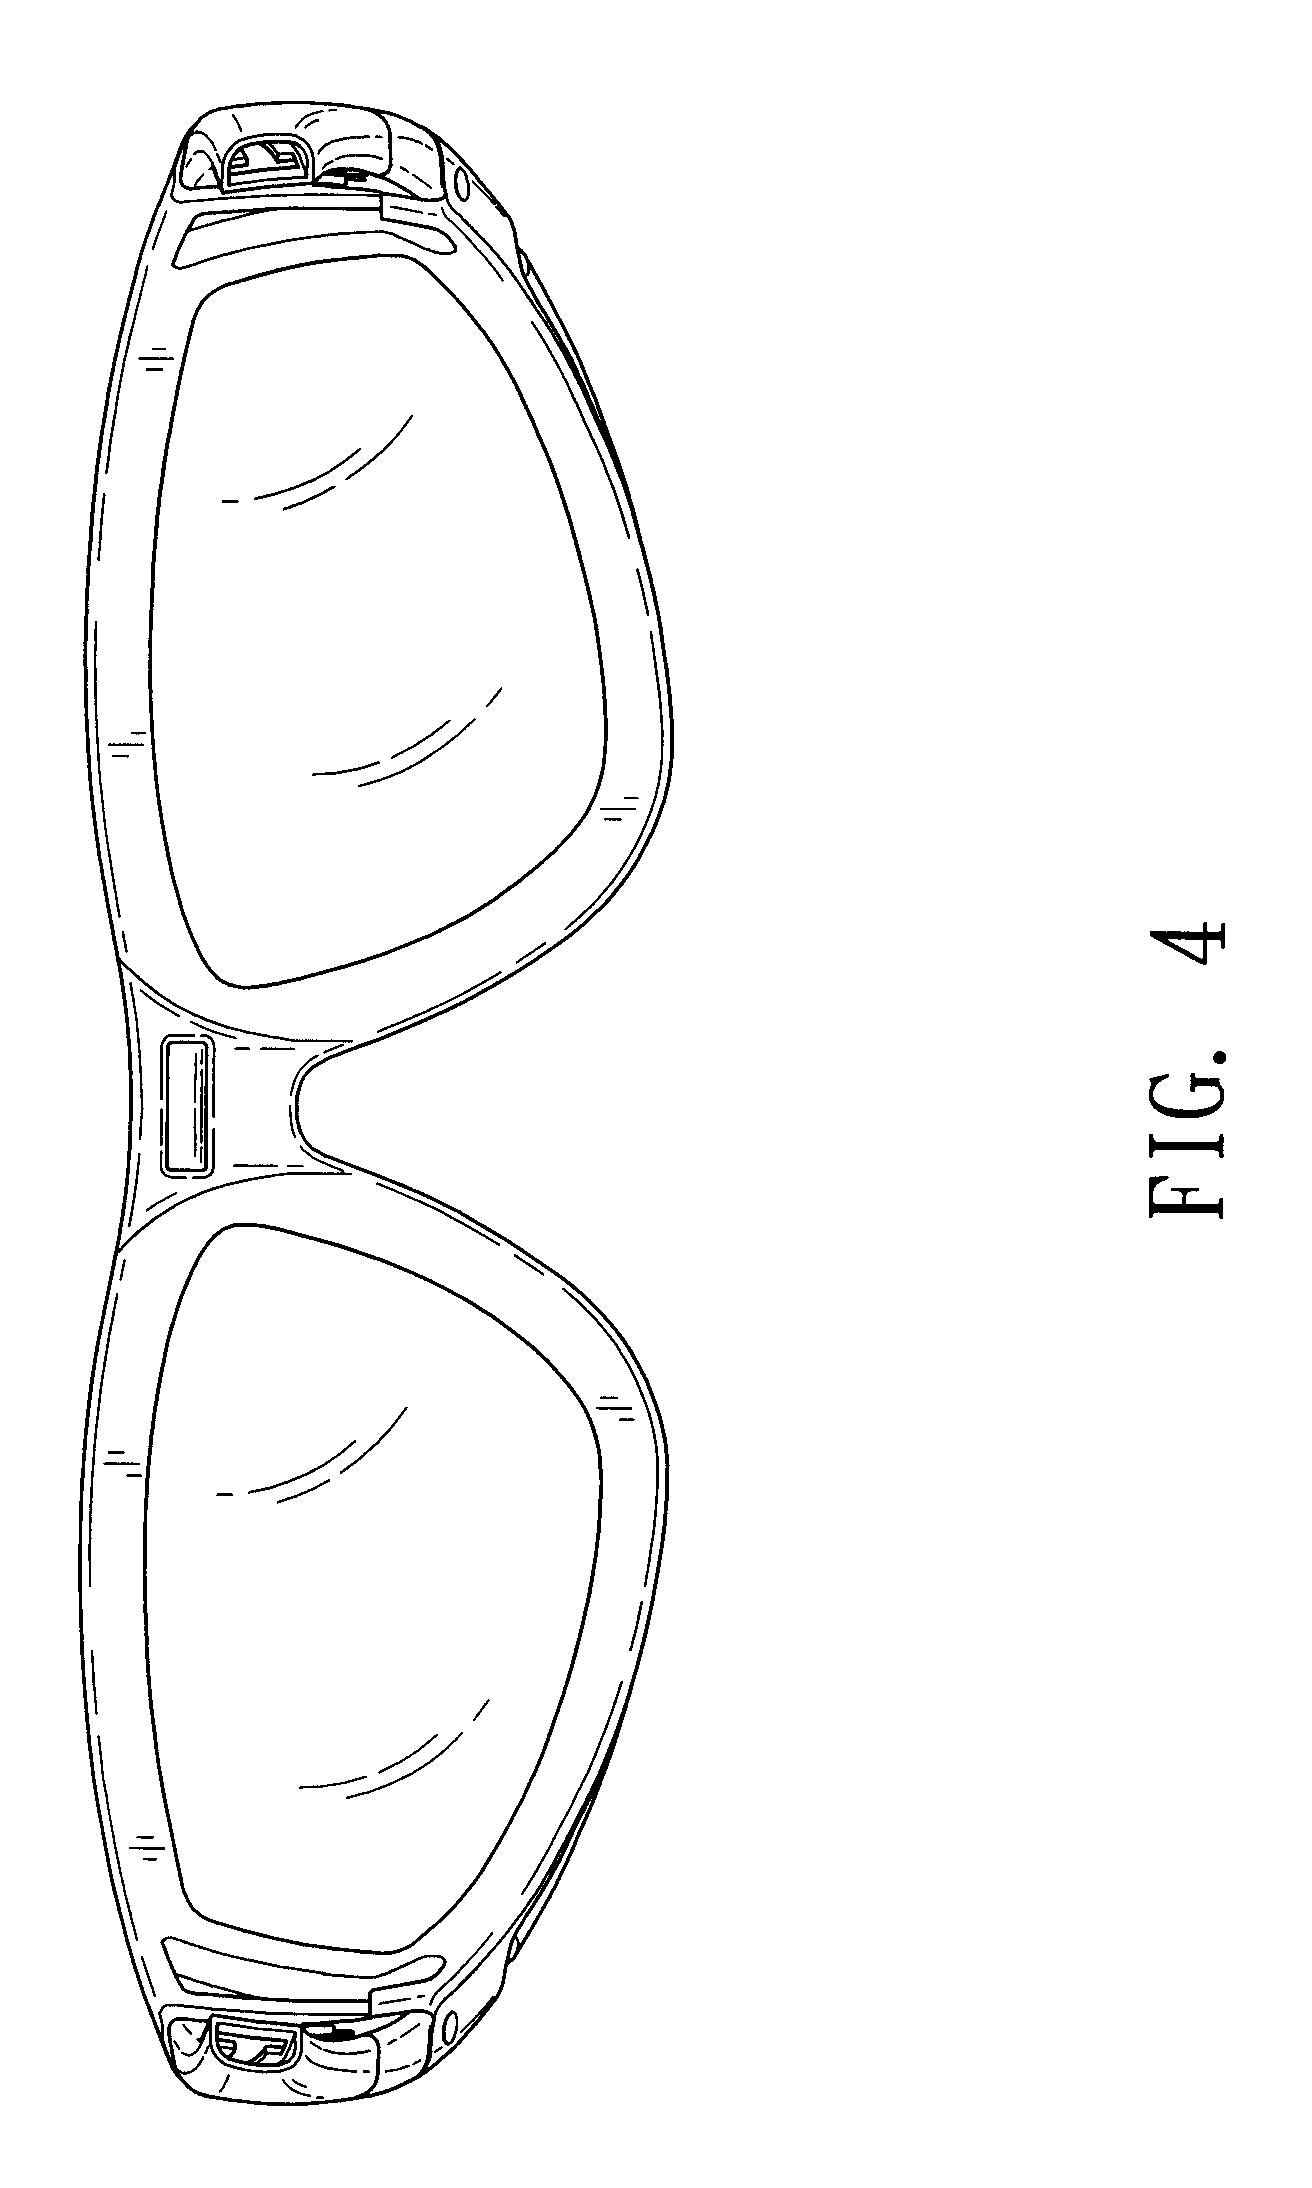 eyeglass sport strap  the eyeglass